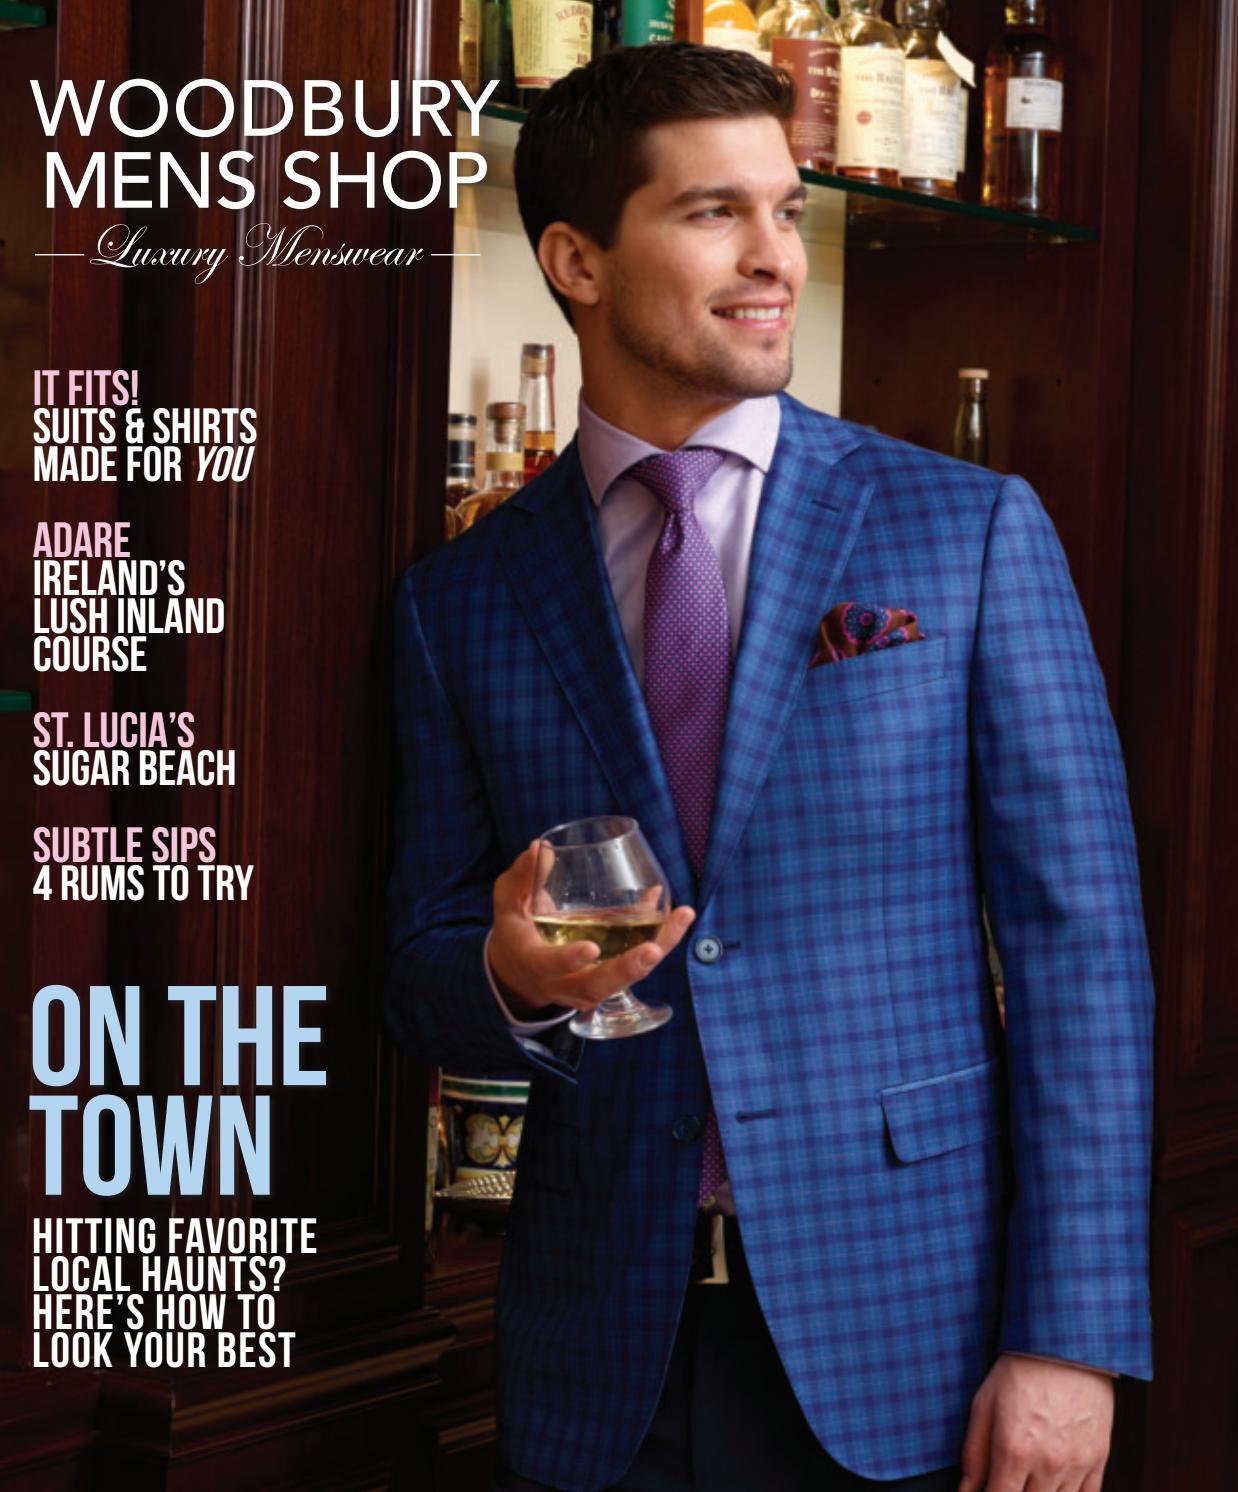 05a4eea788f0f Woodbury Men's Shop: Spring/Summer 2019 by Wainscot Media - issuu